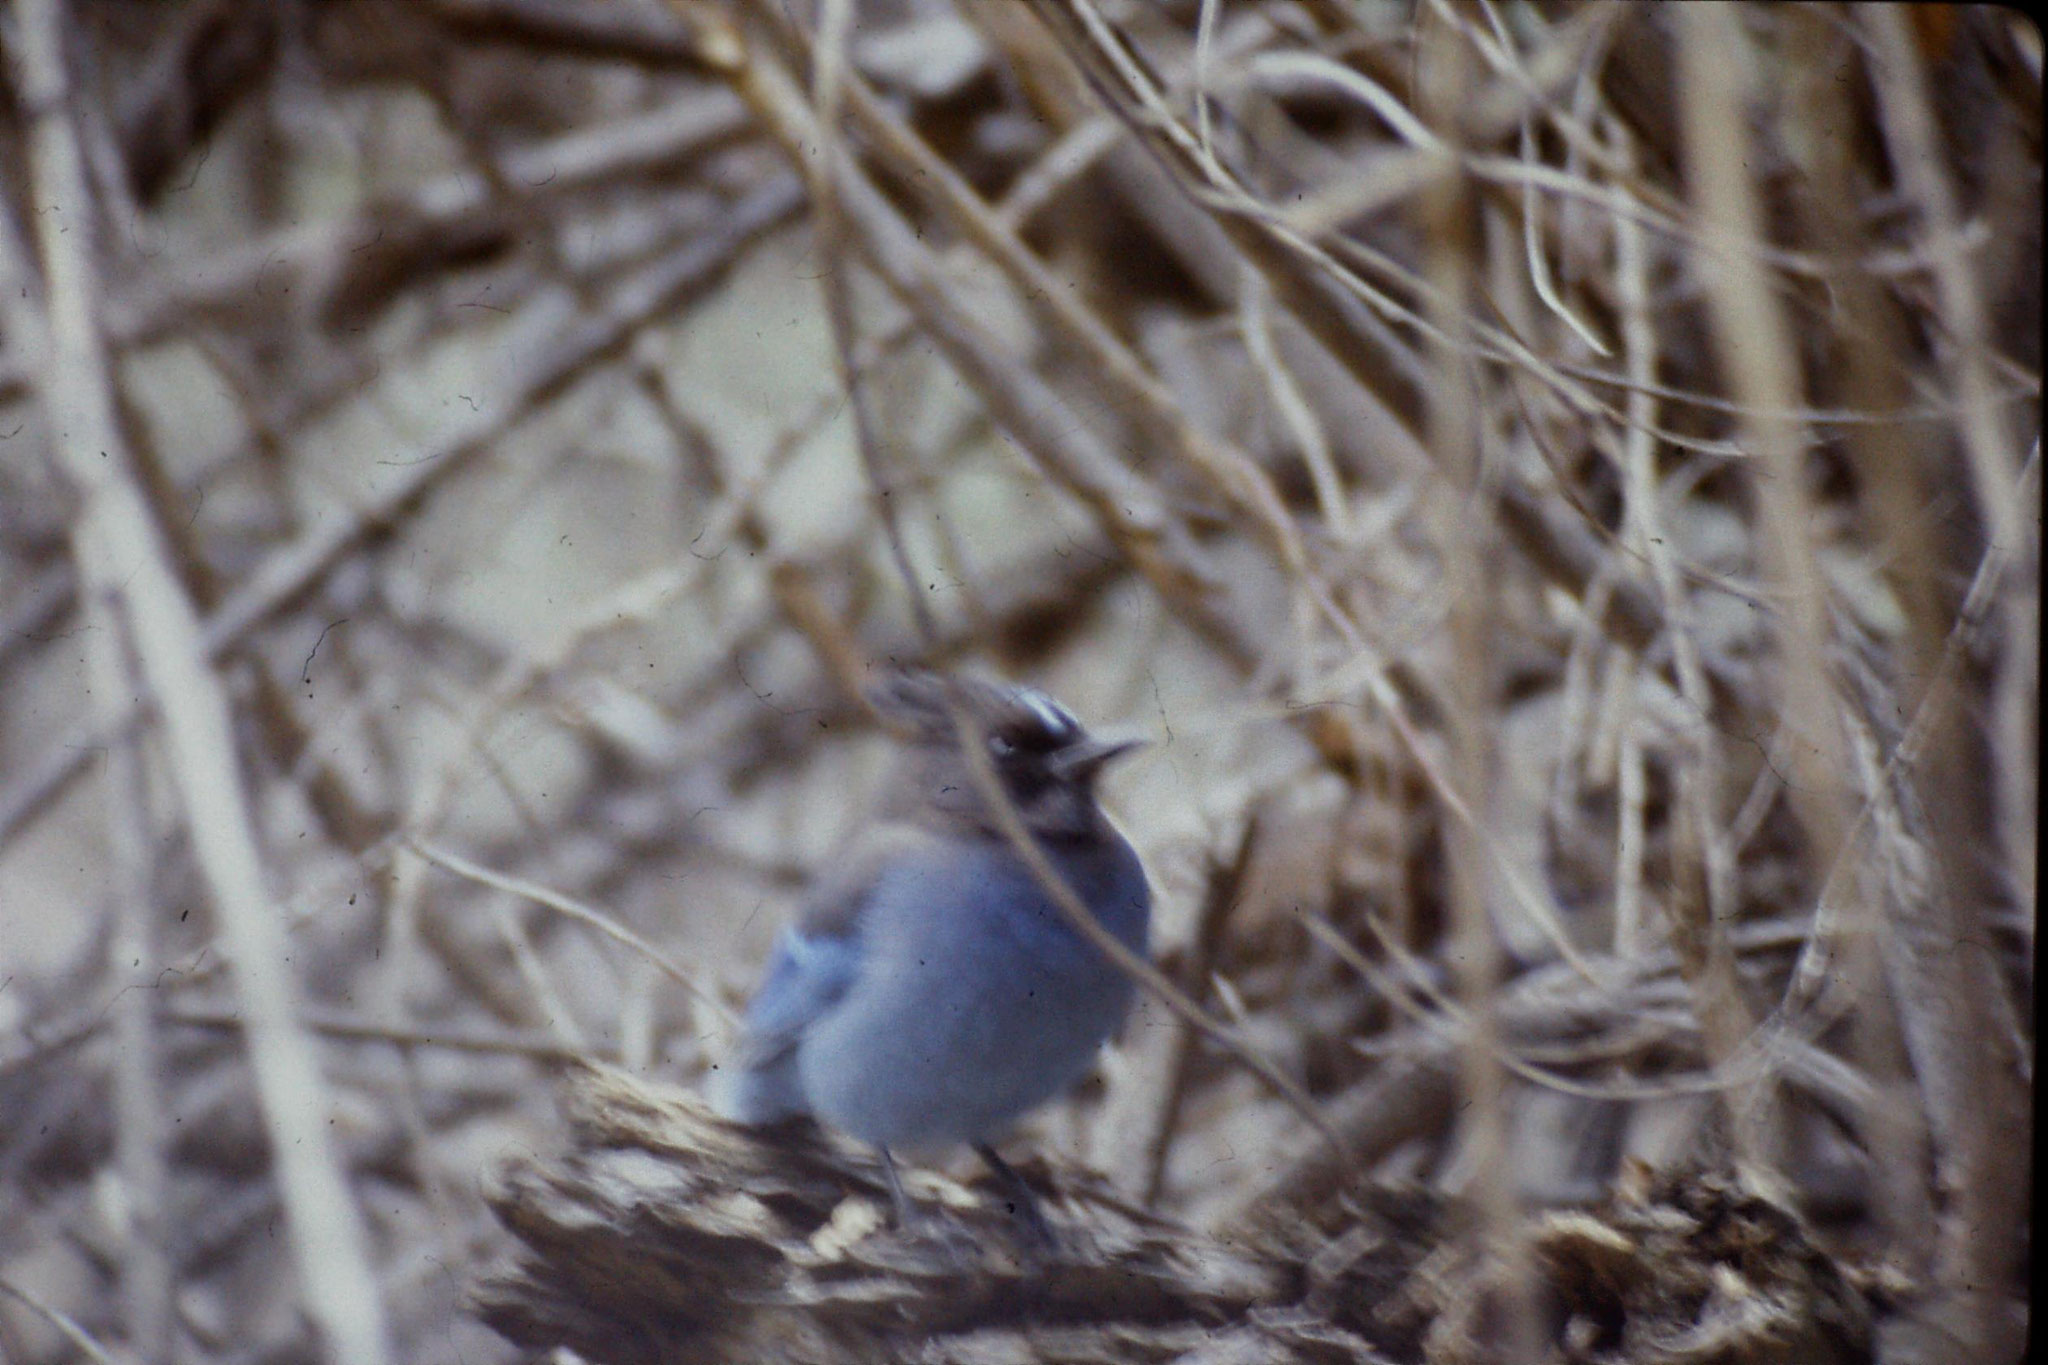 16/2/1991: 17: Yosemite Nat Park, Steller's Jay